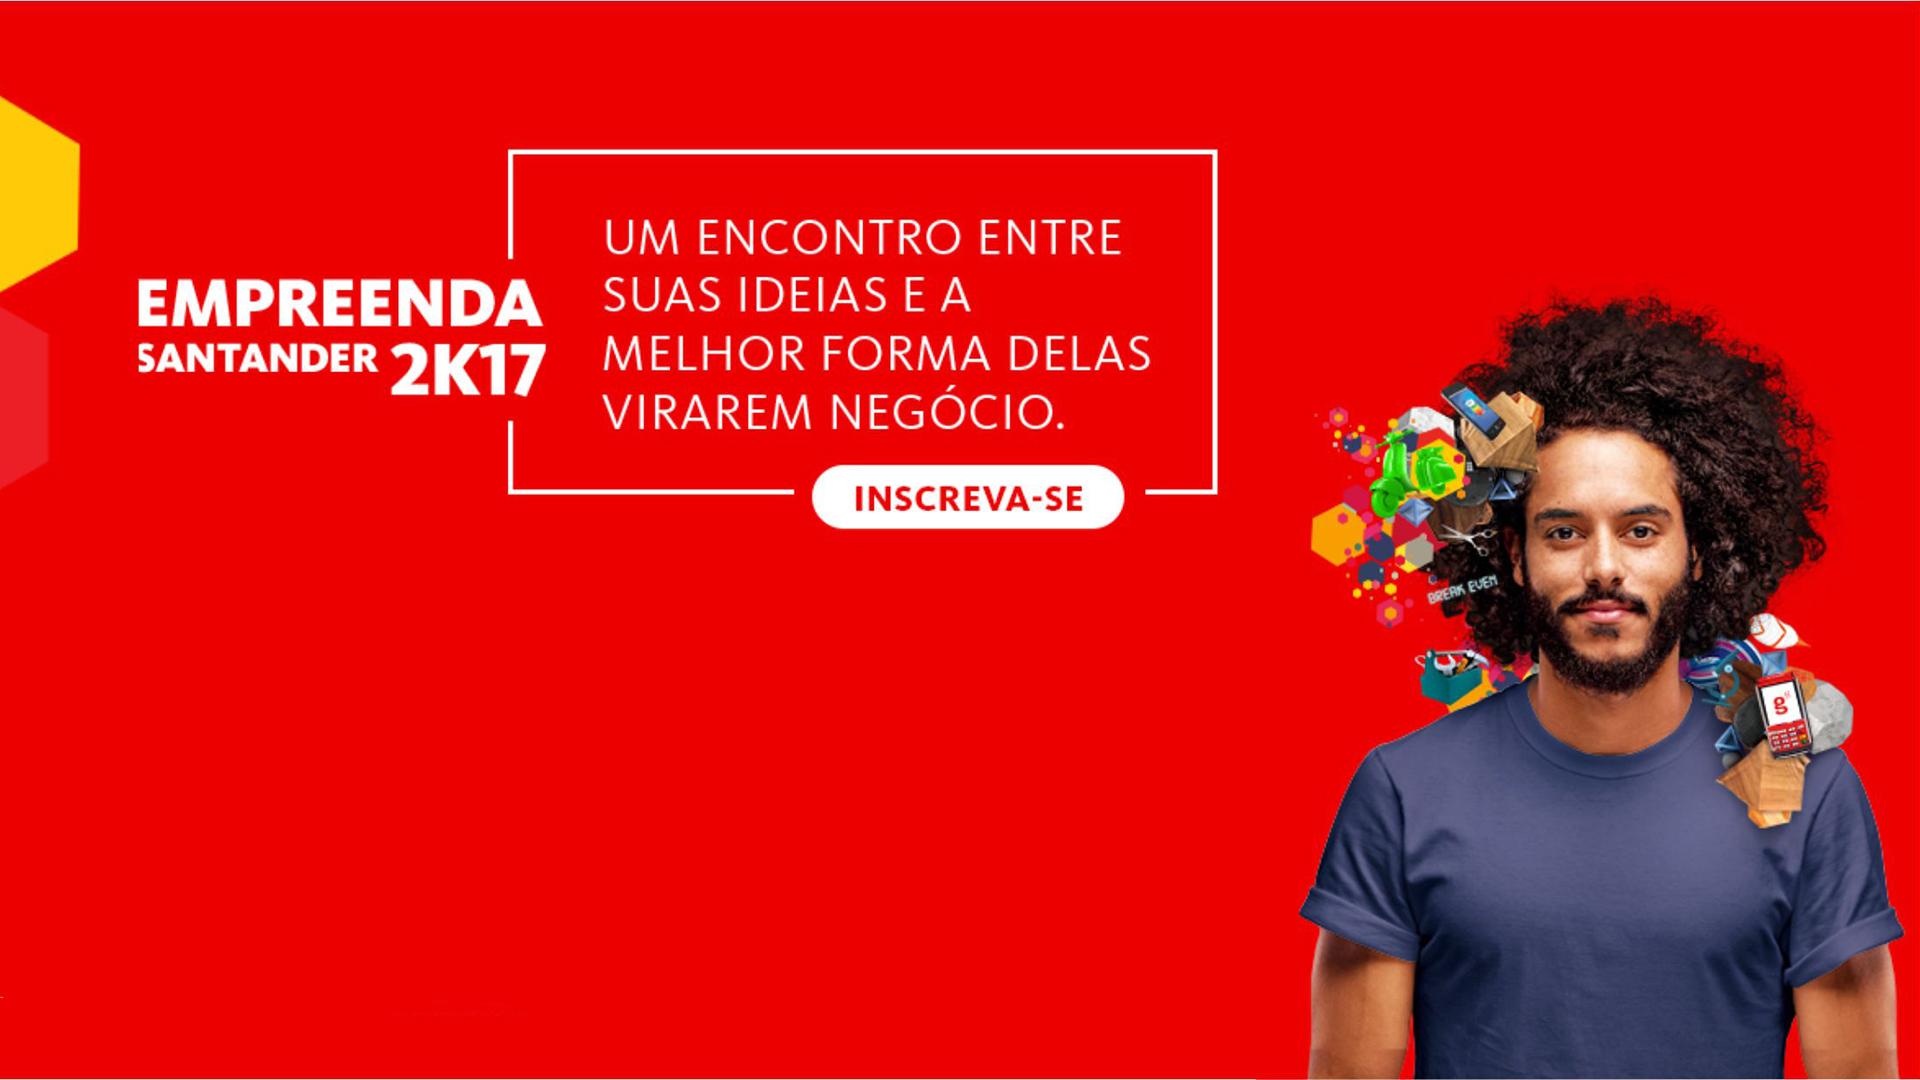 Empreenda Santander 2K17 incentiva ideias e projetos empreendedores